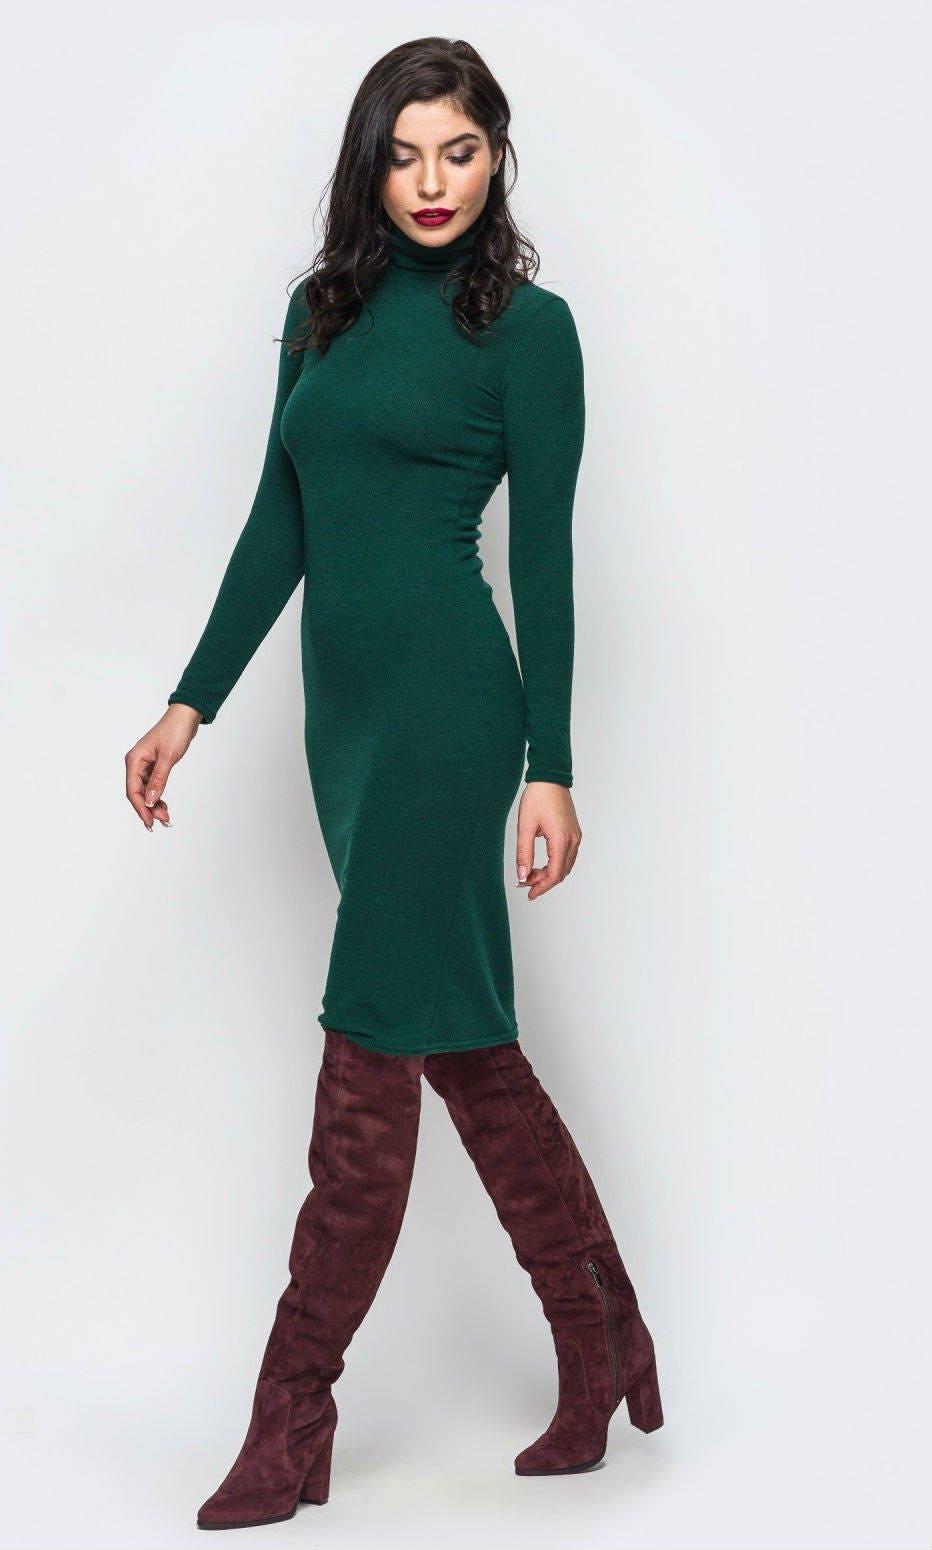 Grüne Angora Kleid gestrickte warme Herbst dunkel grünen Kleid